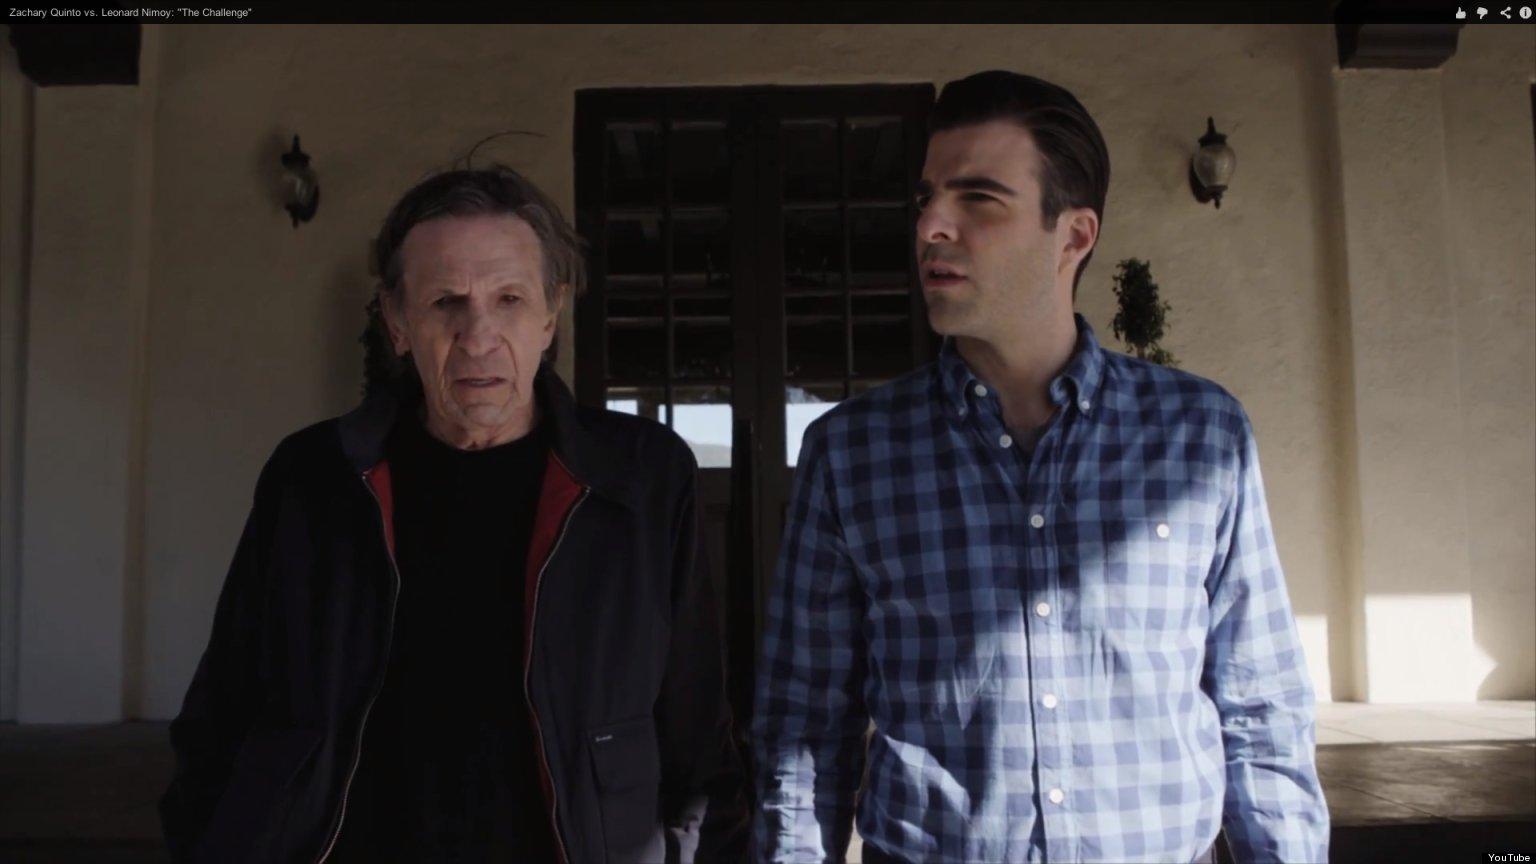 Spock VS Spock: Leonard Nimoy y Zachary Quinto juntos.